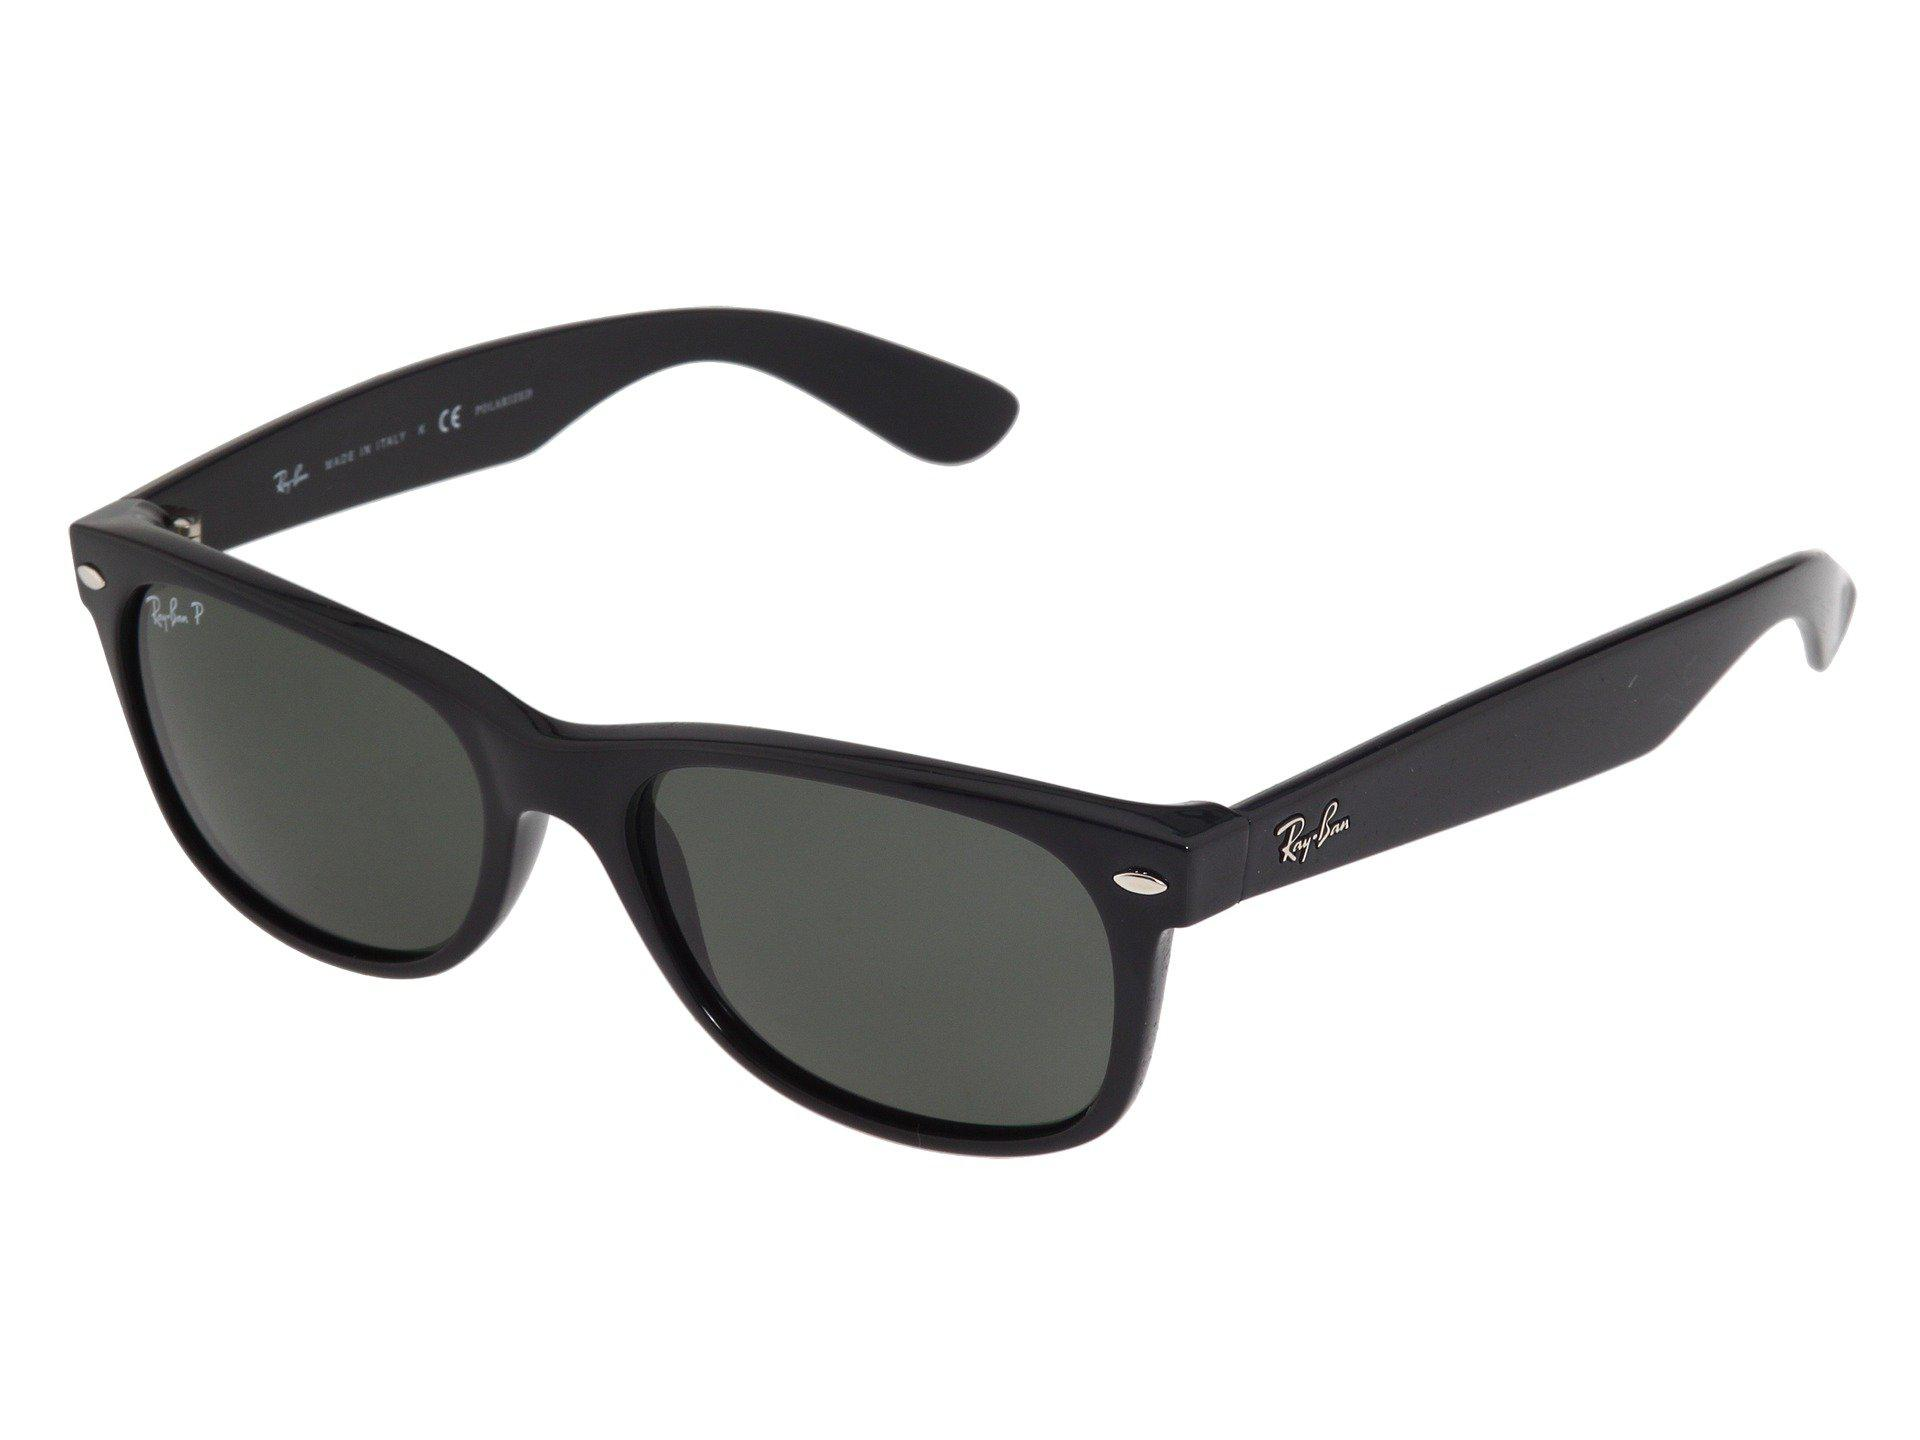 780a16a87a Ray-Ban. Women s Black Rb2132 New Wayfarer Polarized 55mm (tortoise crystal  Green Polarized Lens) Fashion Sunglasses